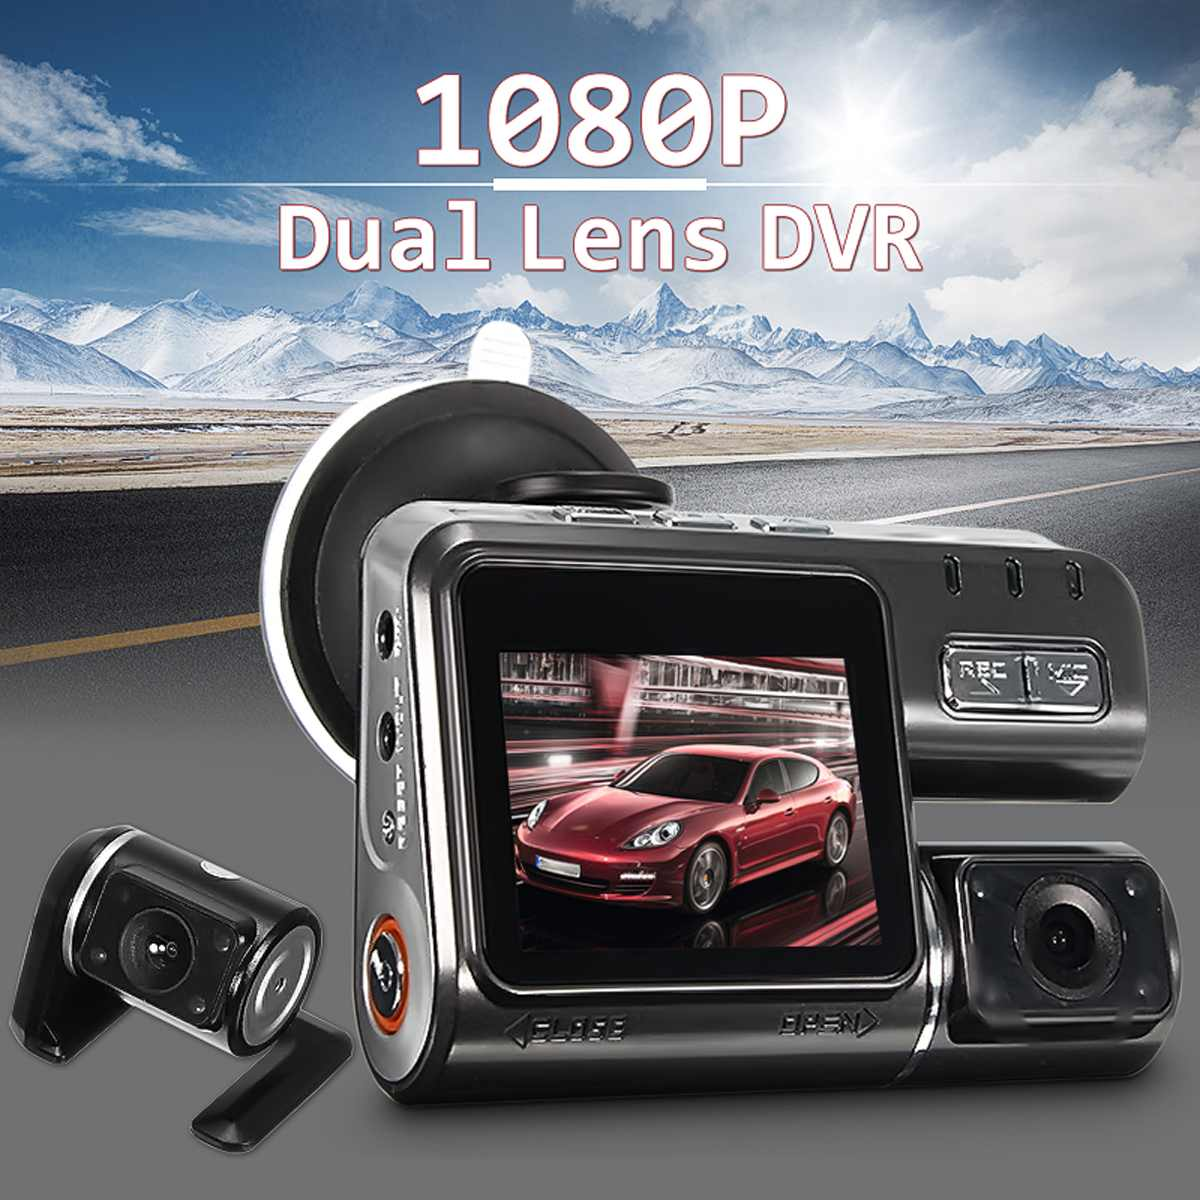 Car-Camera Video-Record G-Sensor Vehicle Dual-Lens Full-Hd 1080P And